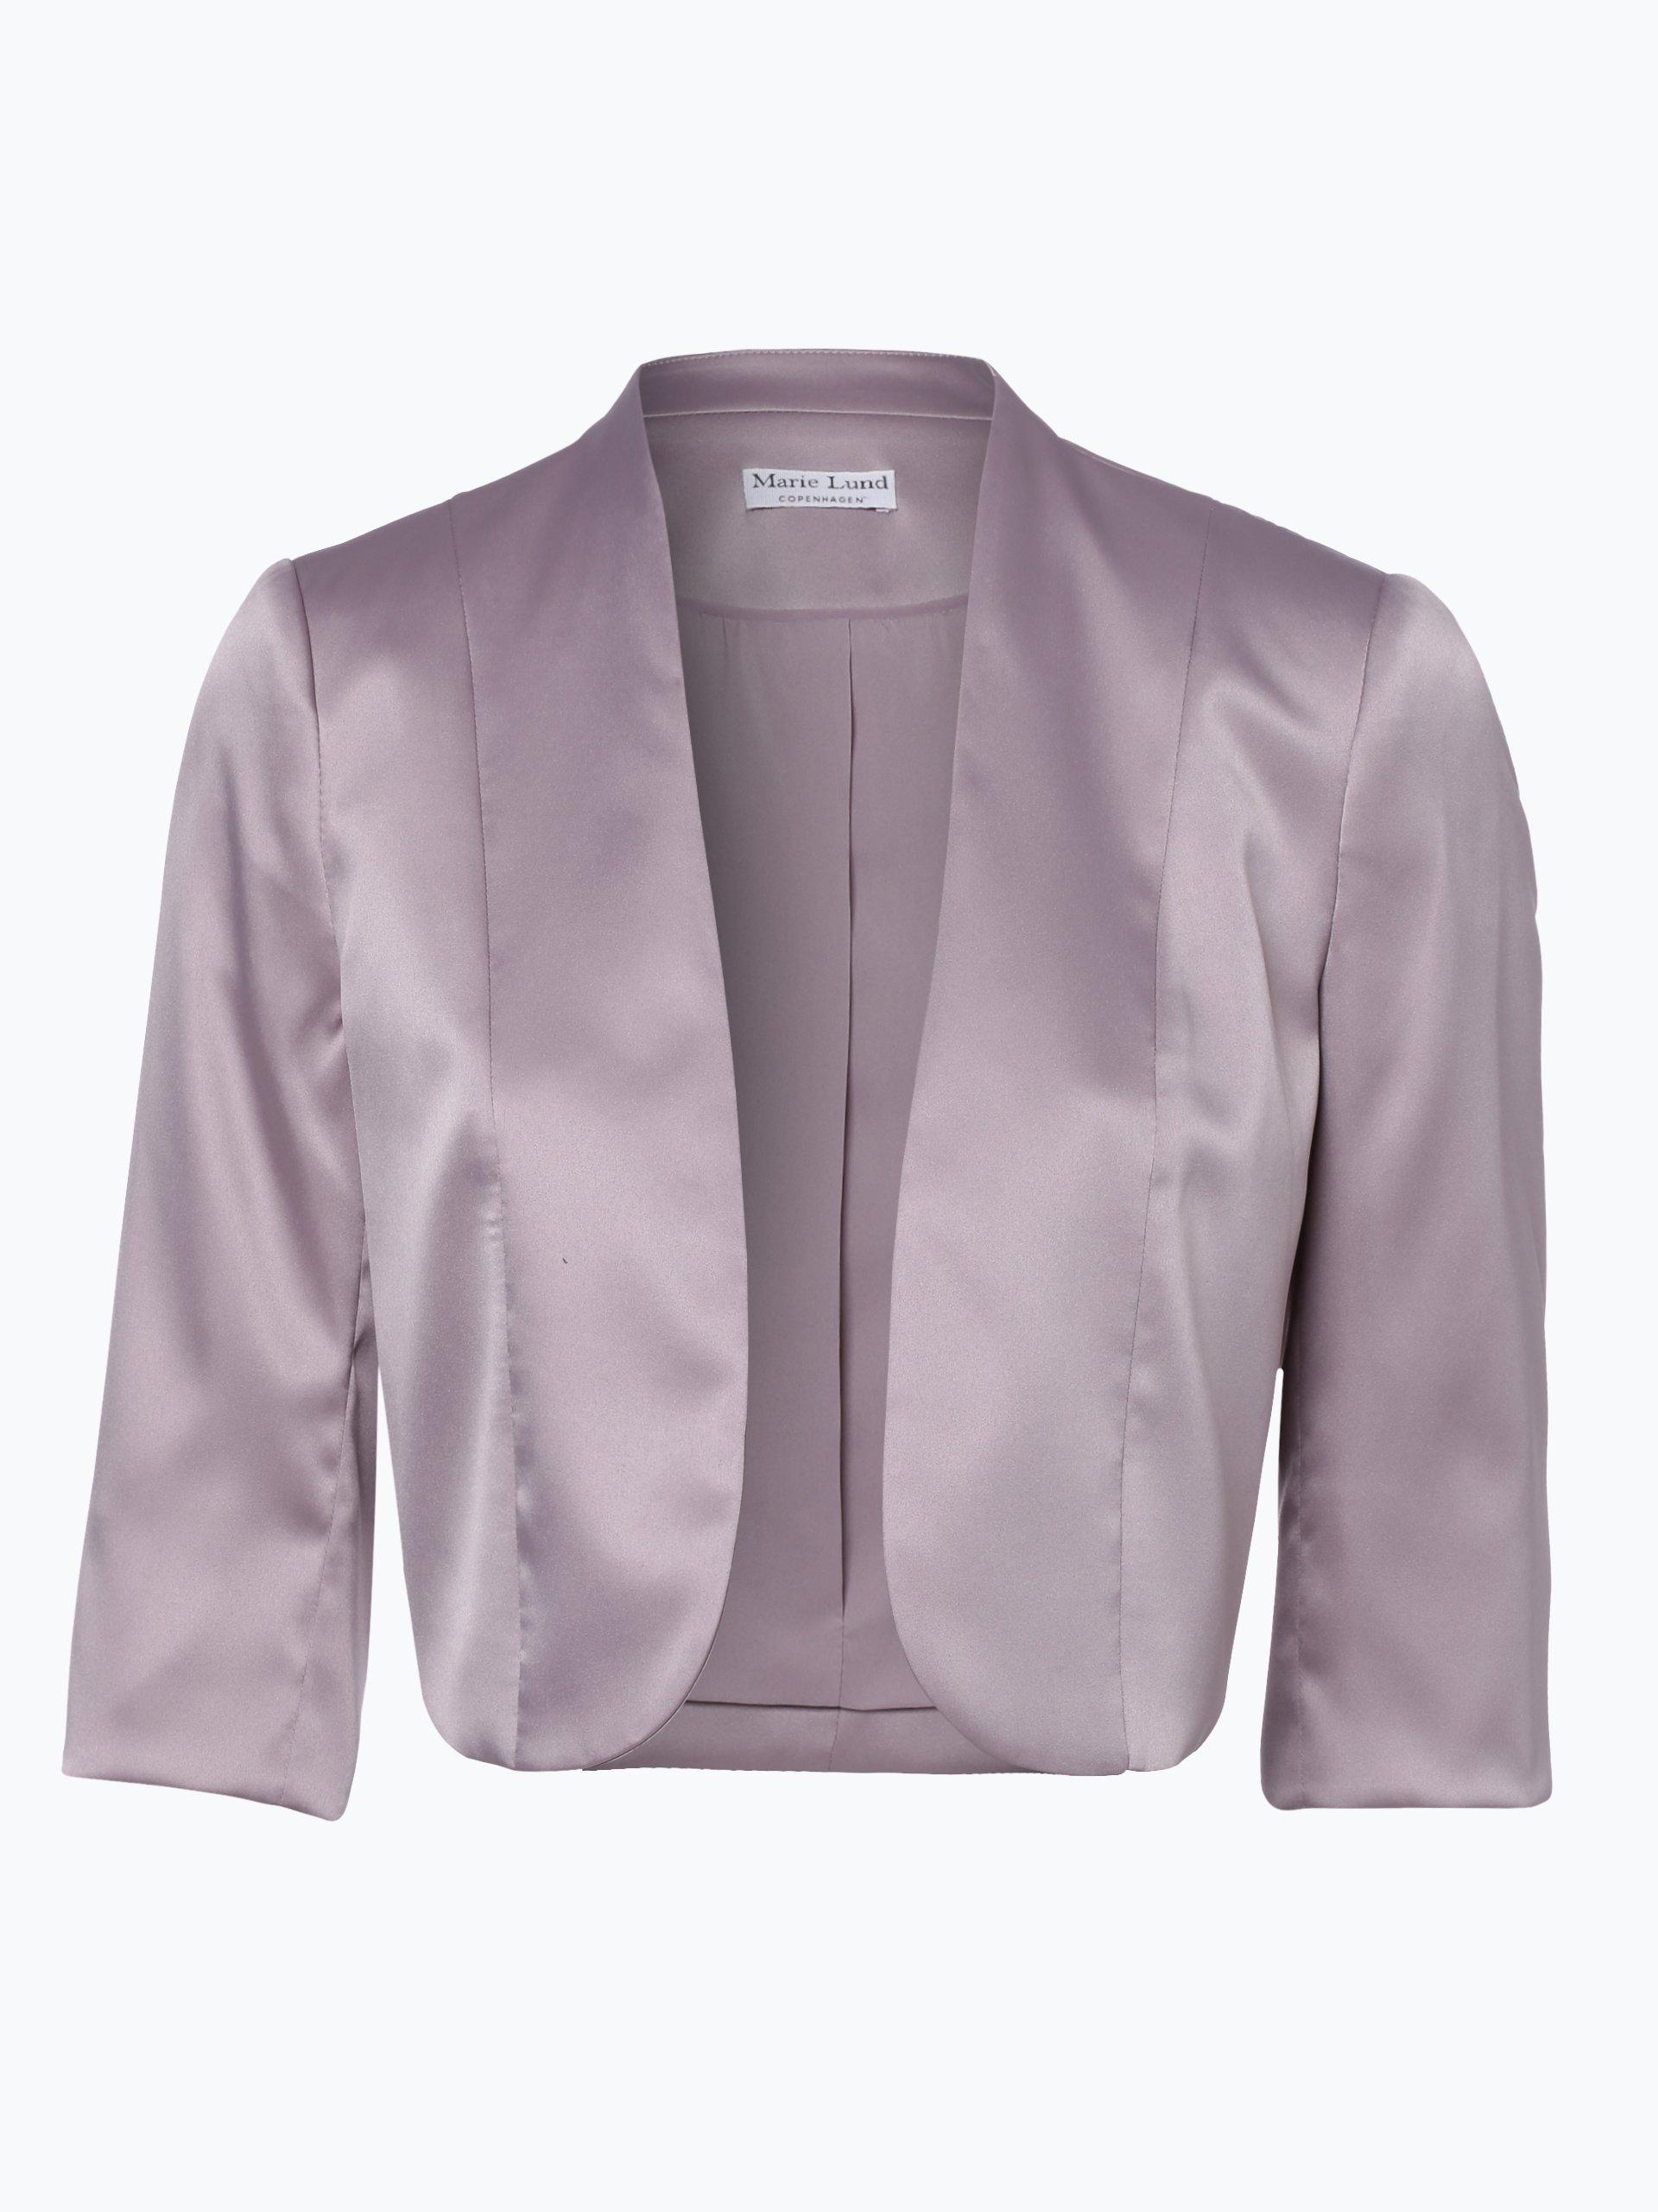 Marie lund damen bolero rosenholz uni online kaufen for Garderobe bolero